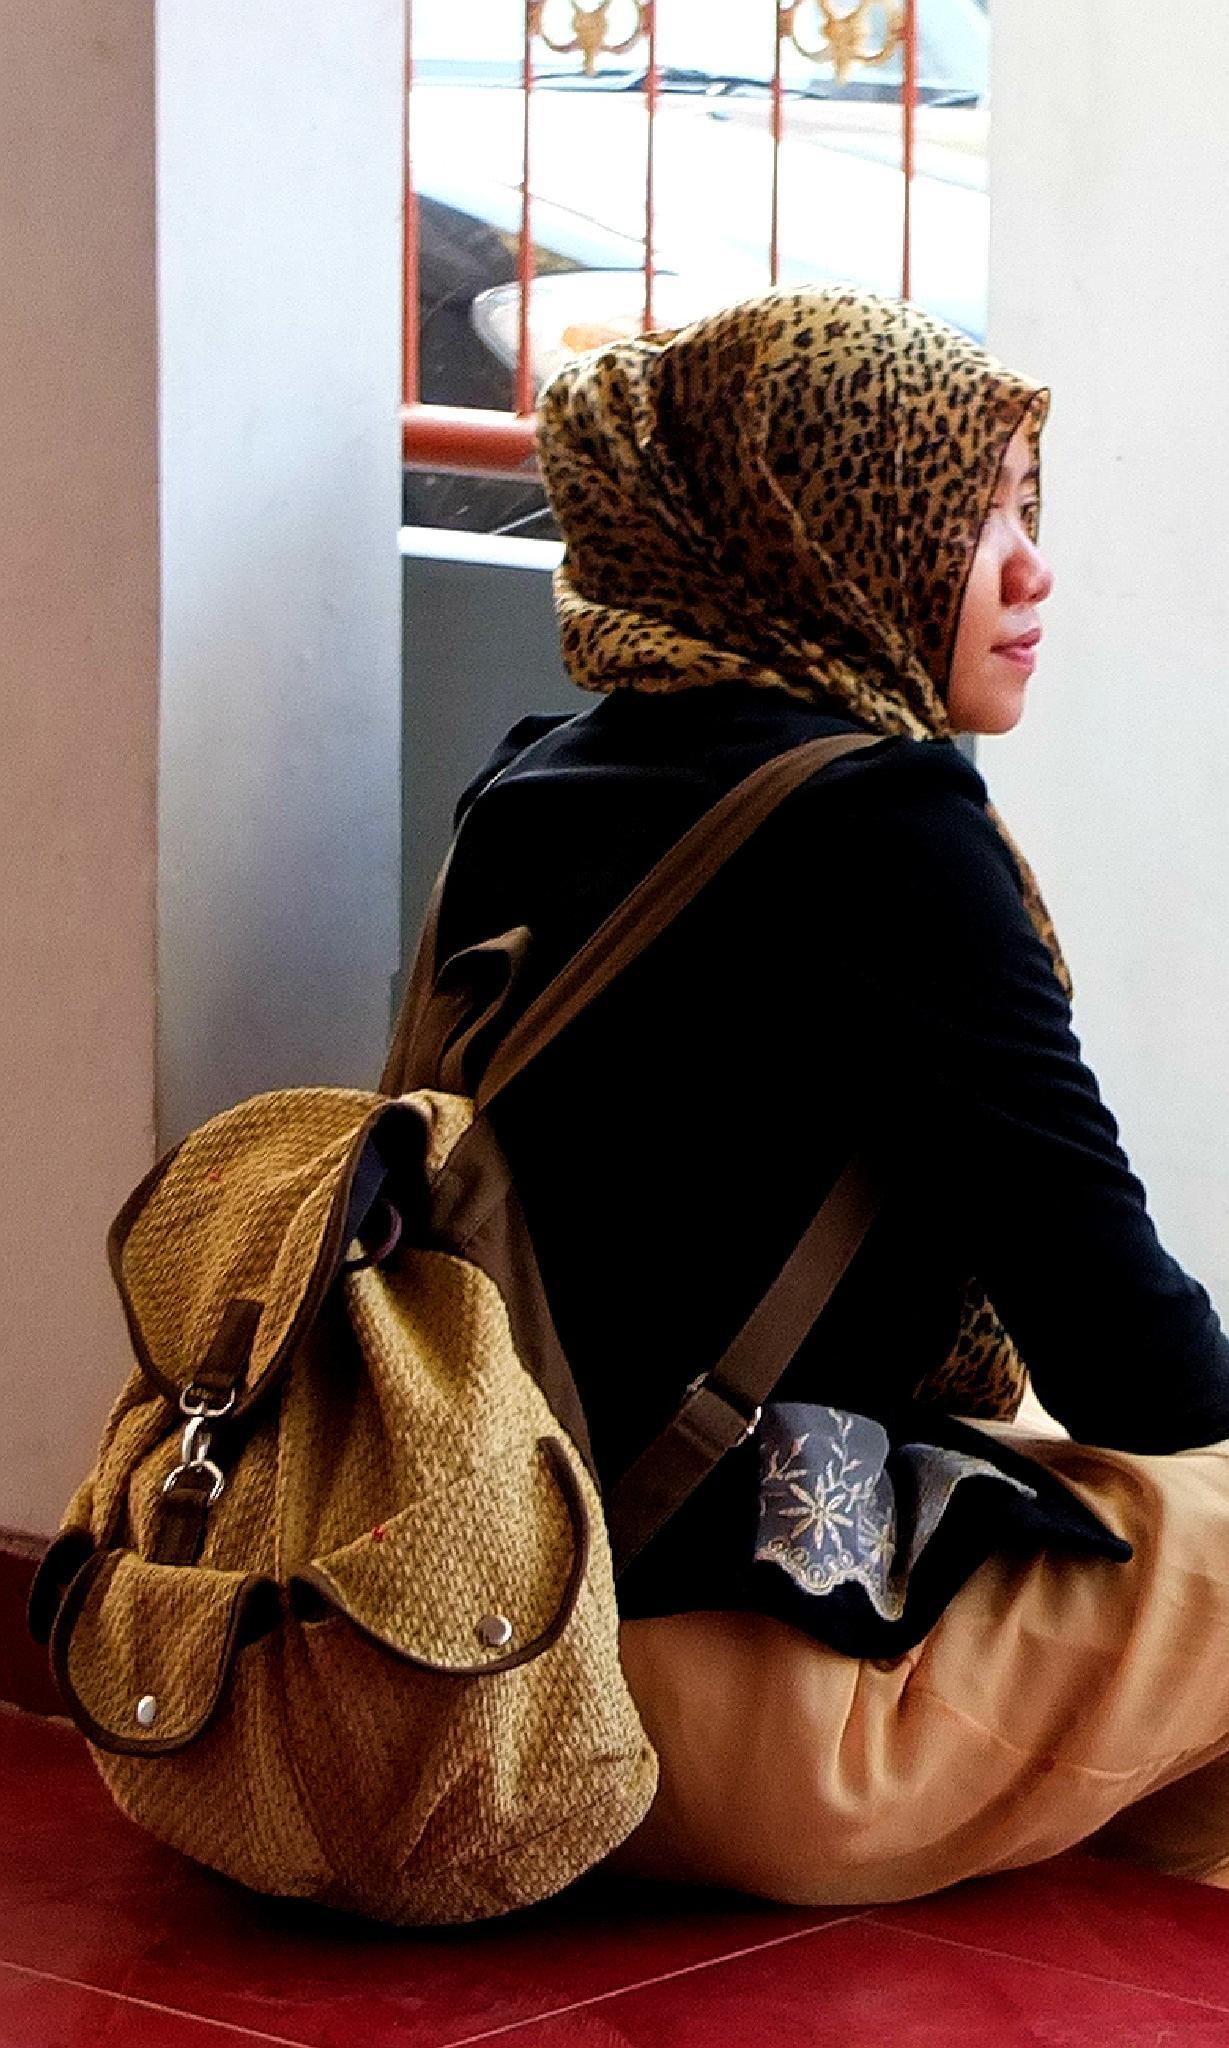 Indonesian Girl by Lukiman